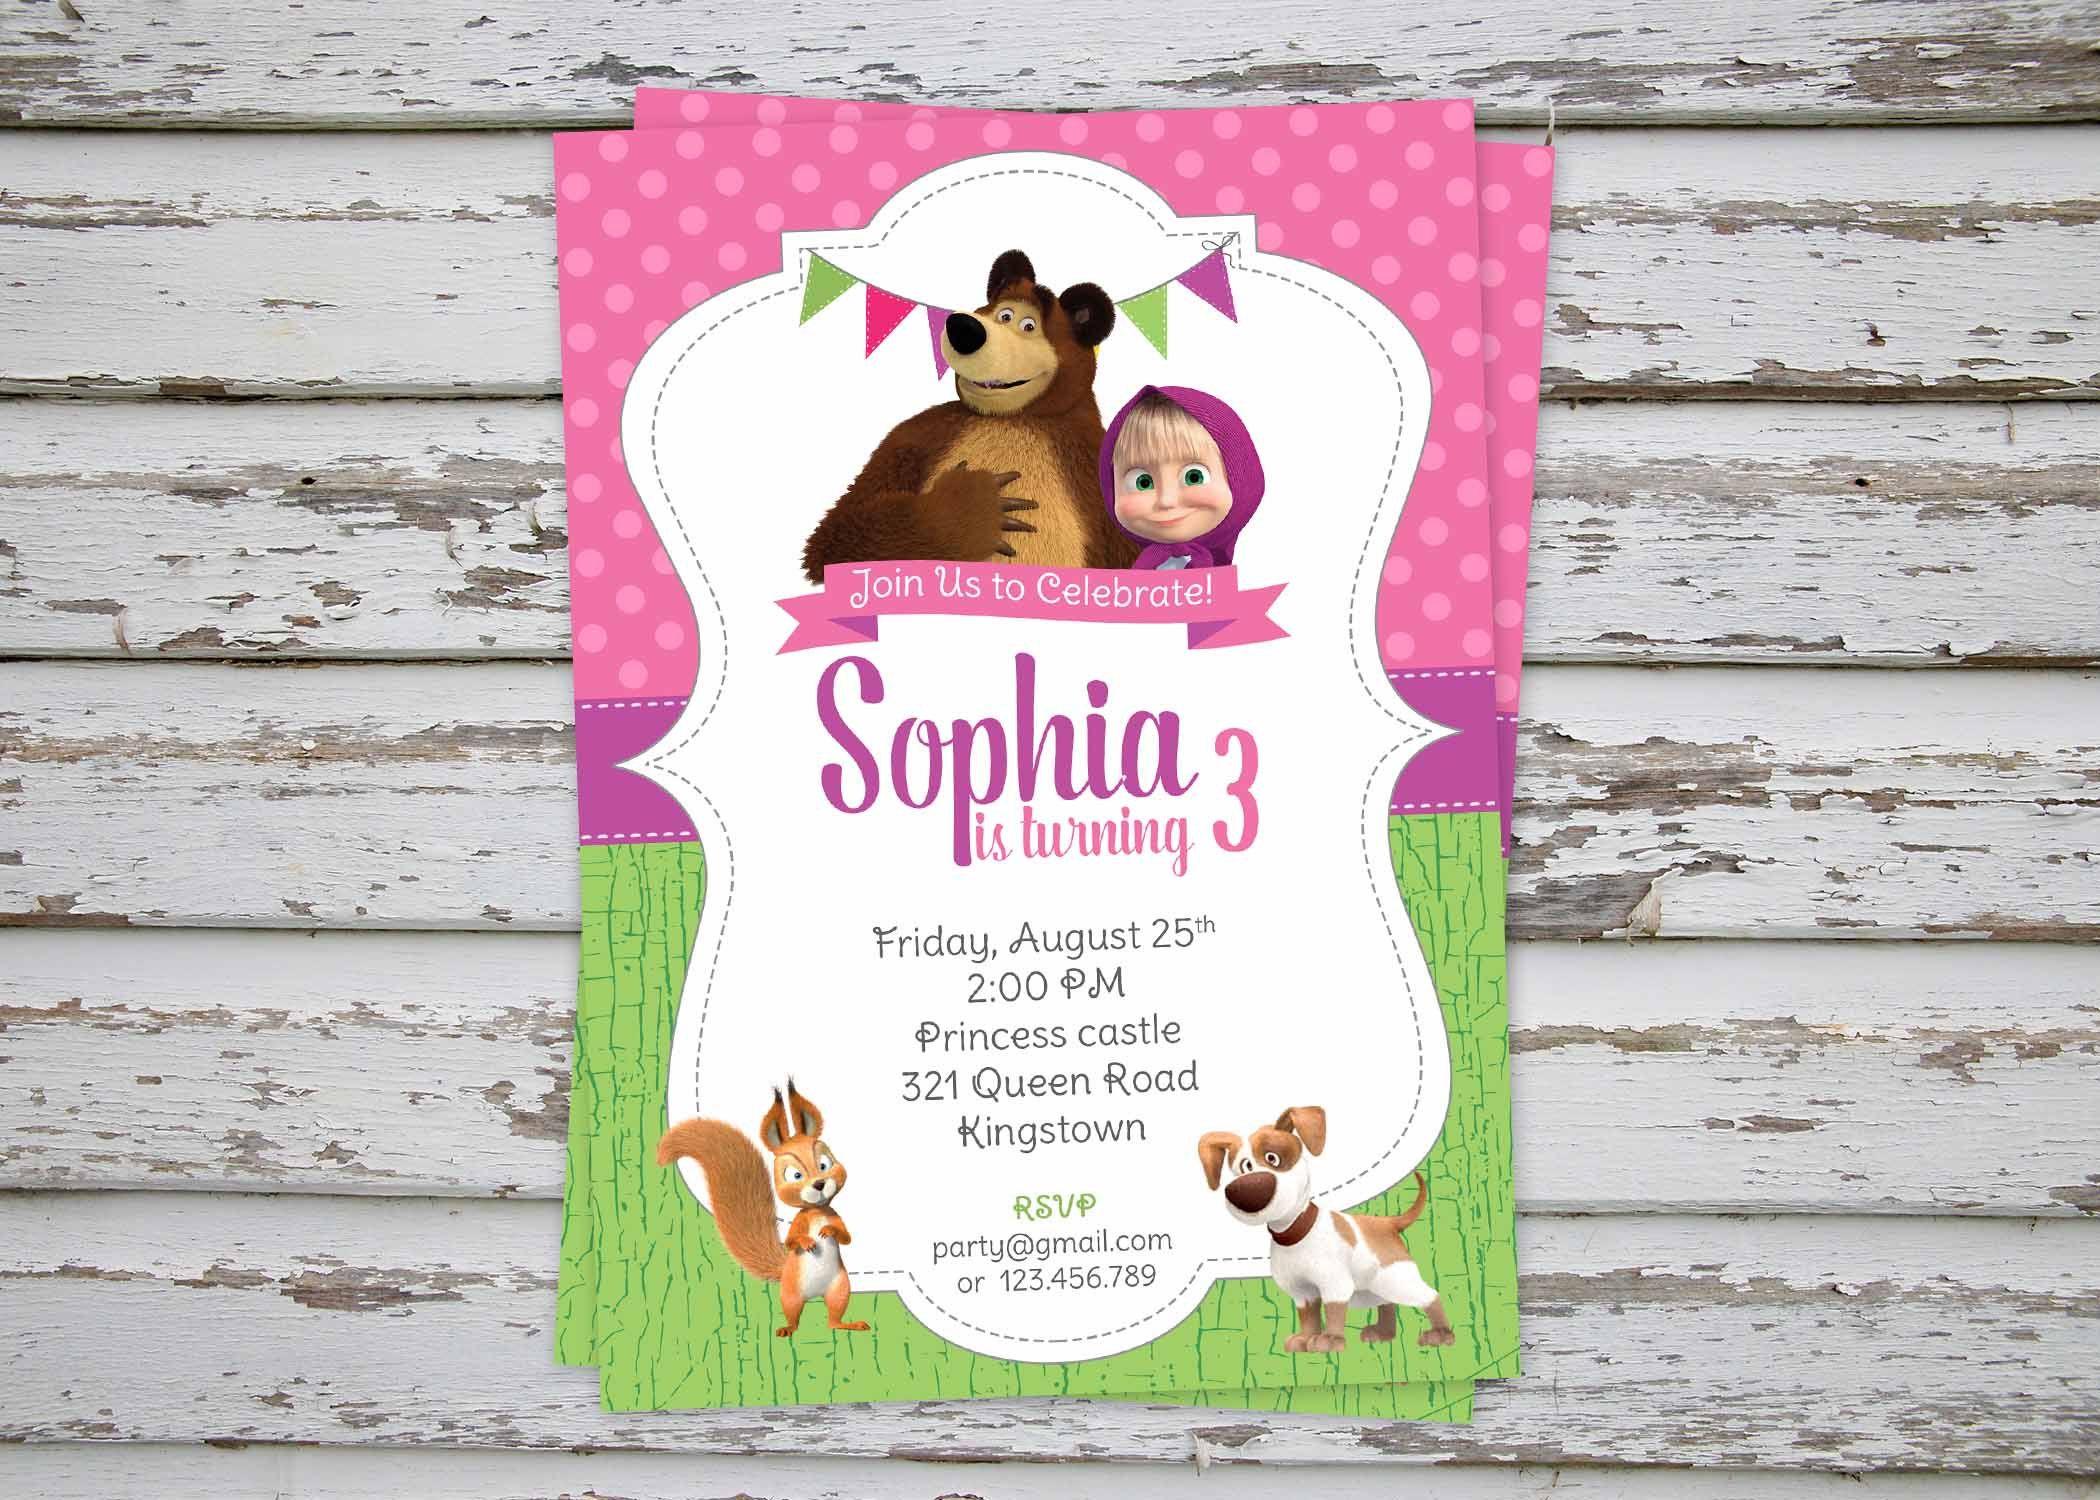 Masha And The Bear Birthday Party Invitation Printable